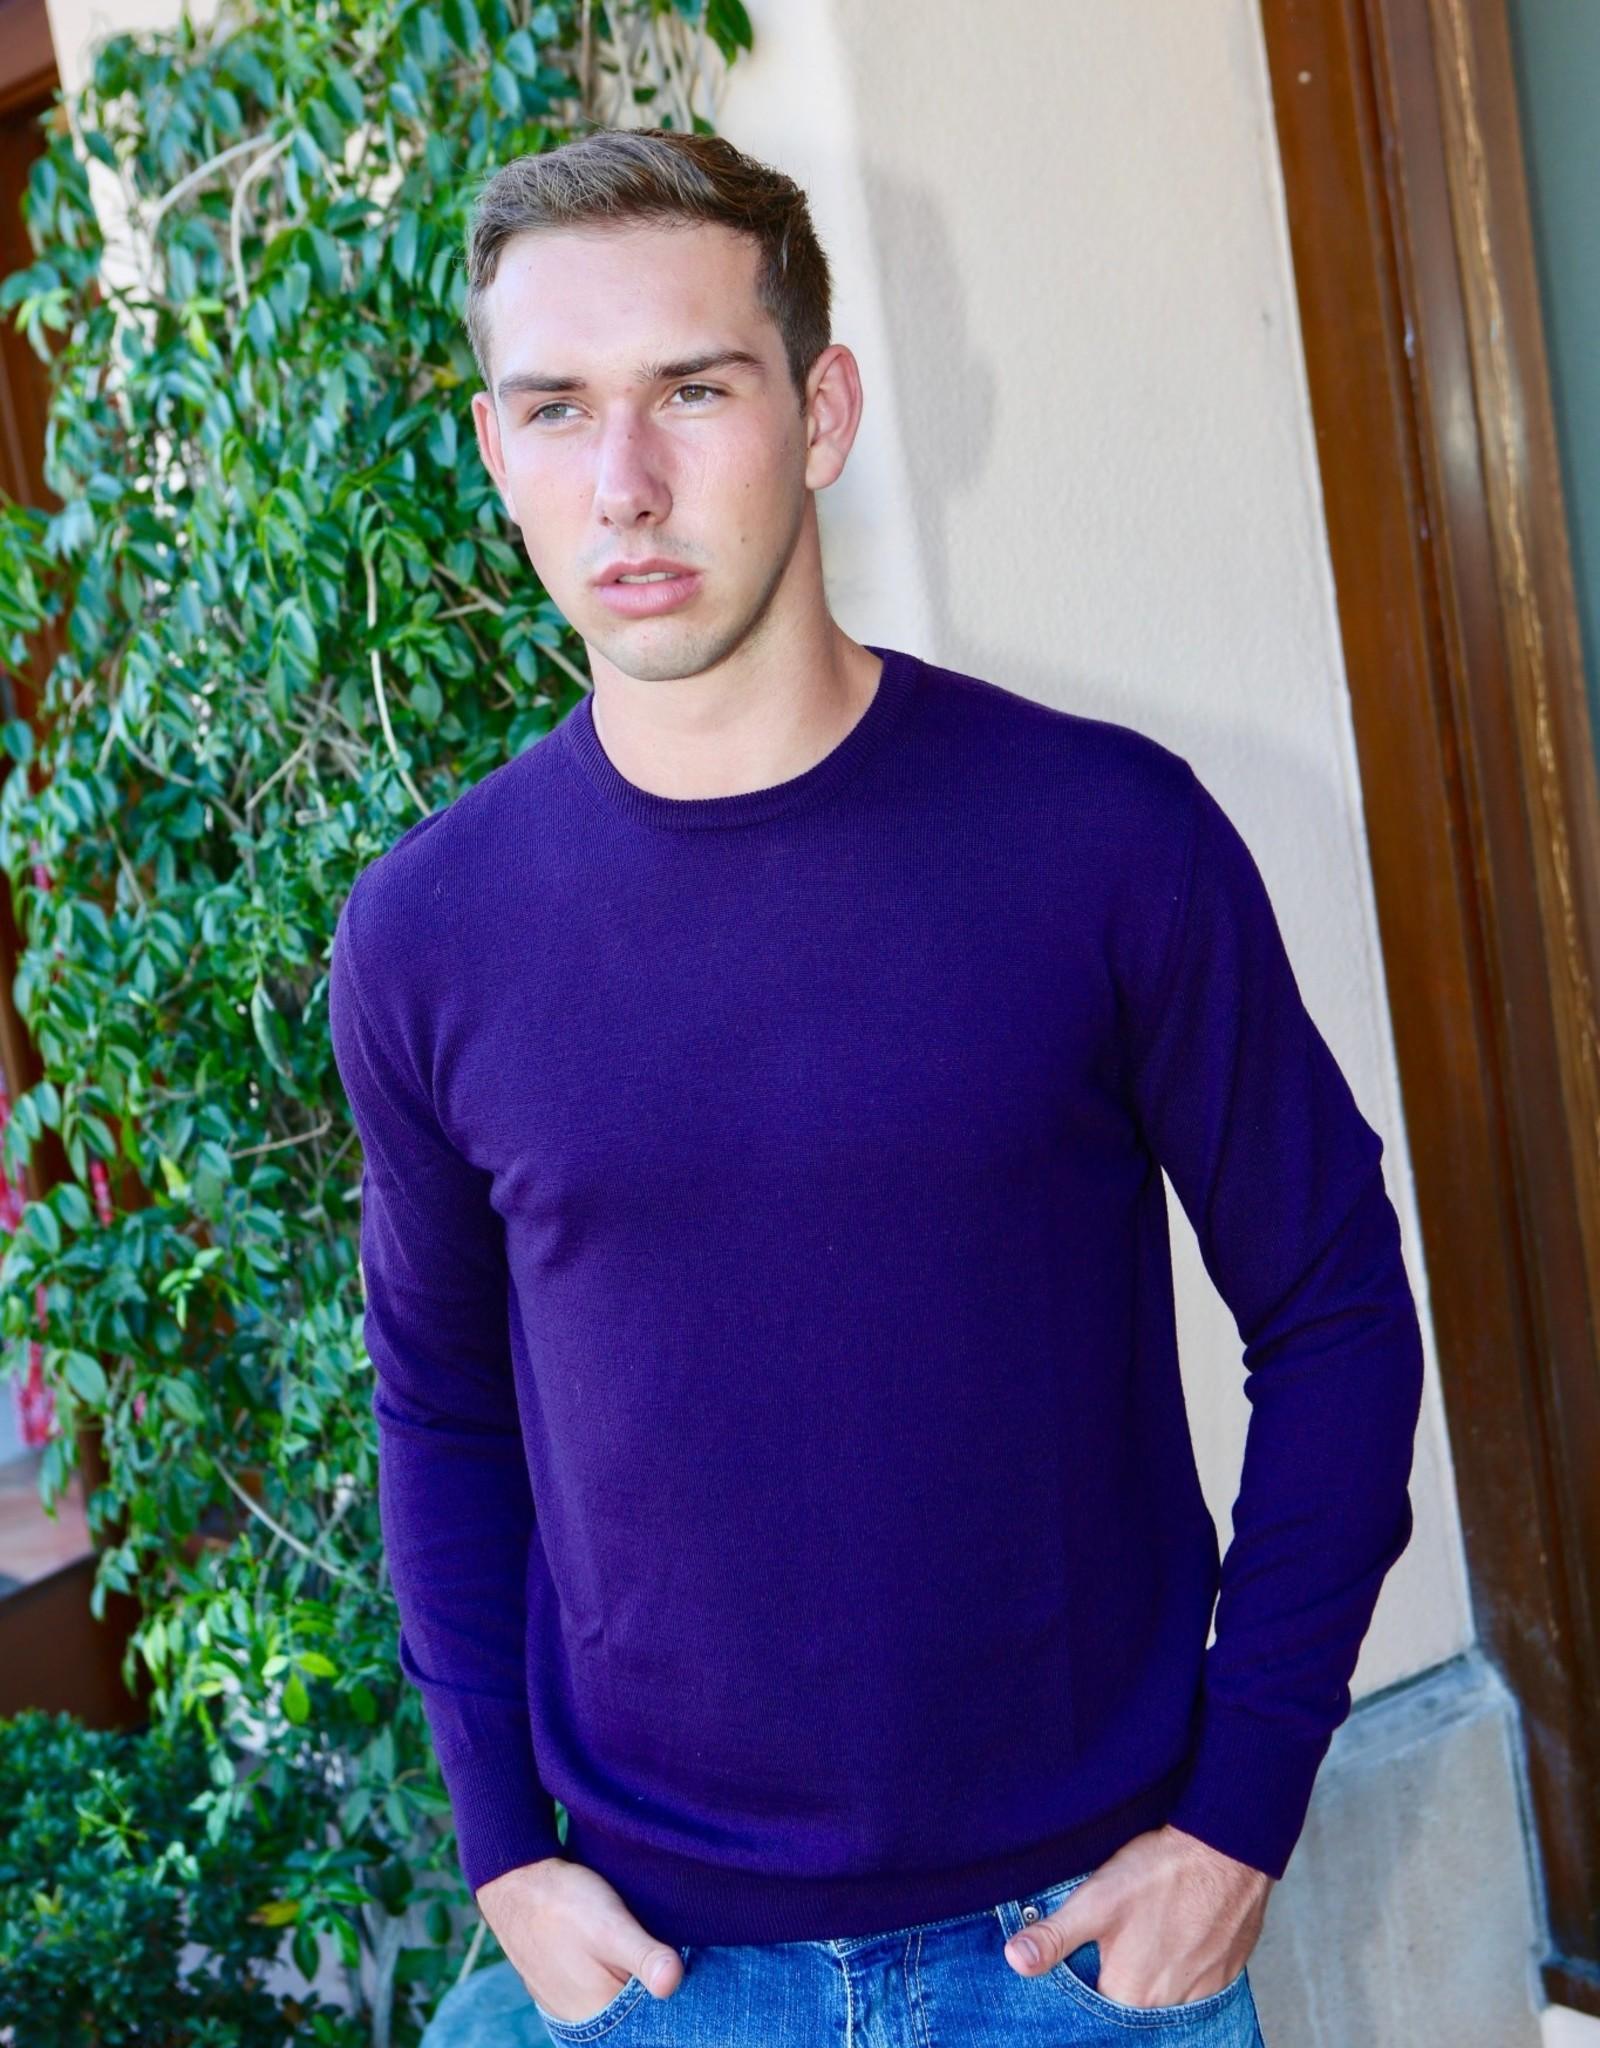 Umberto Vallati Crew Neck Extrafine Knit Sweater